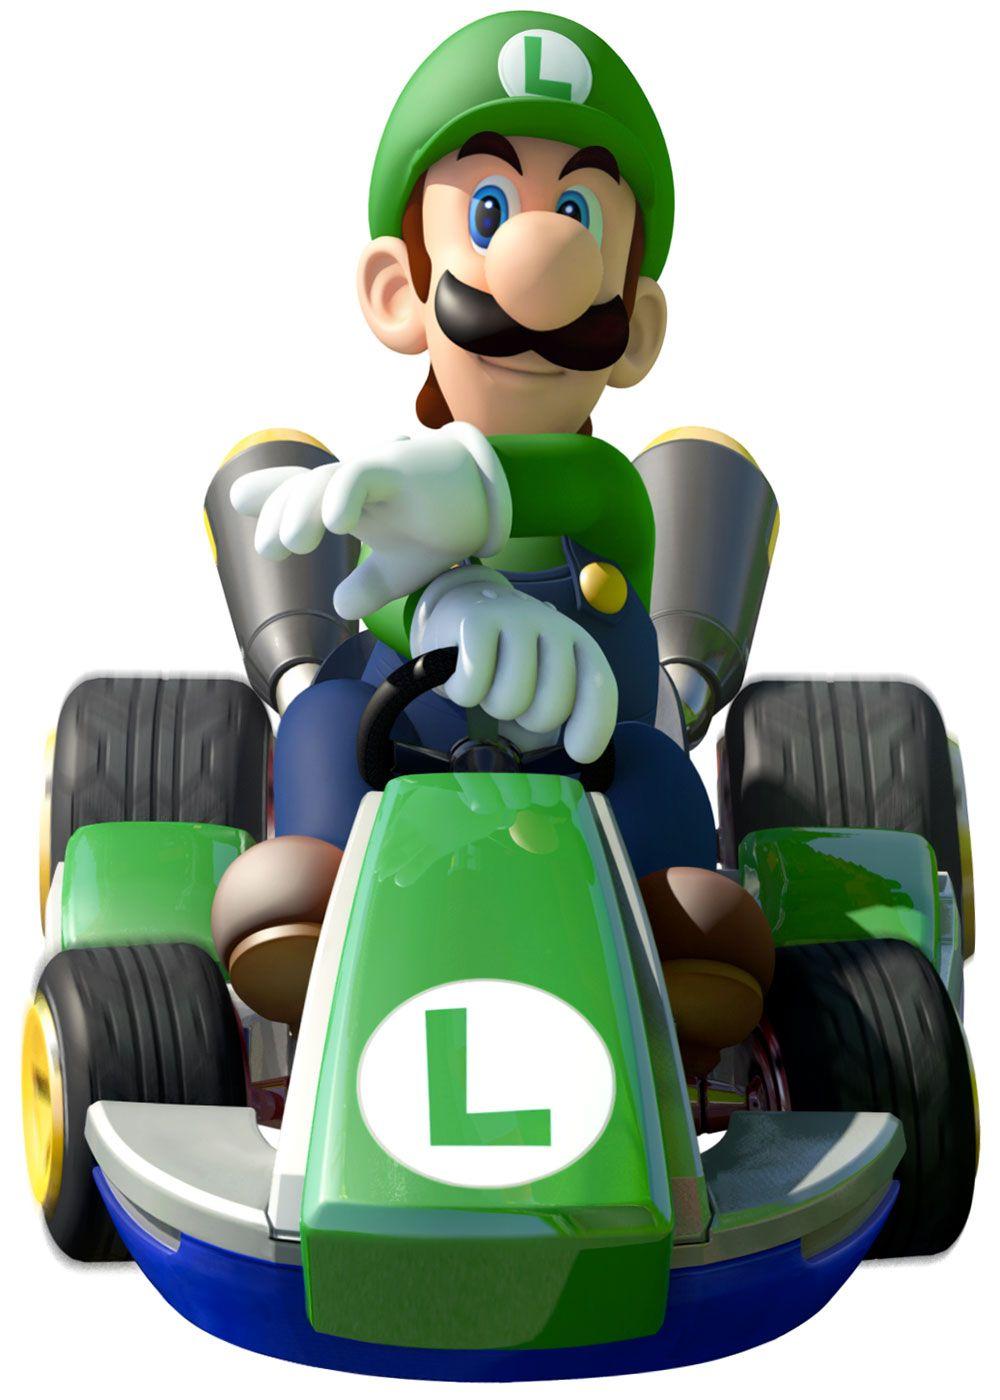 Luigi Mario Kart 8 Super Mario Kart Mario Kart 8 Mario